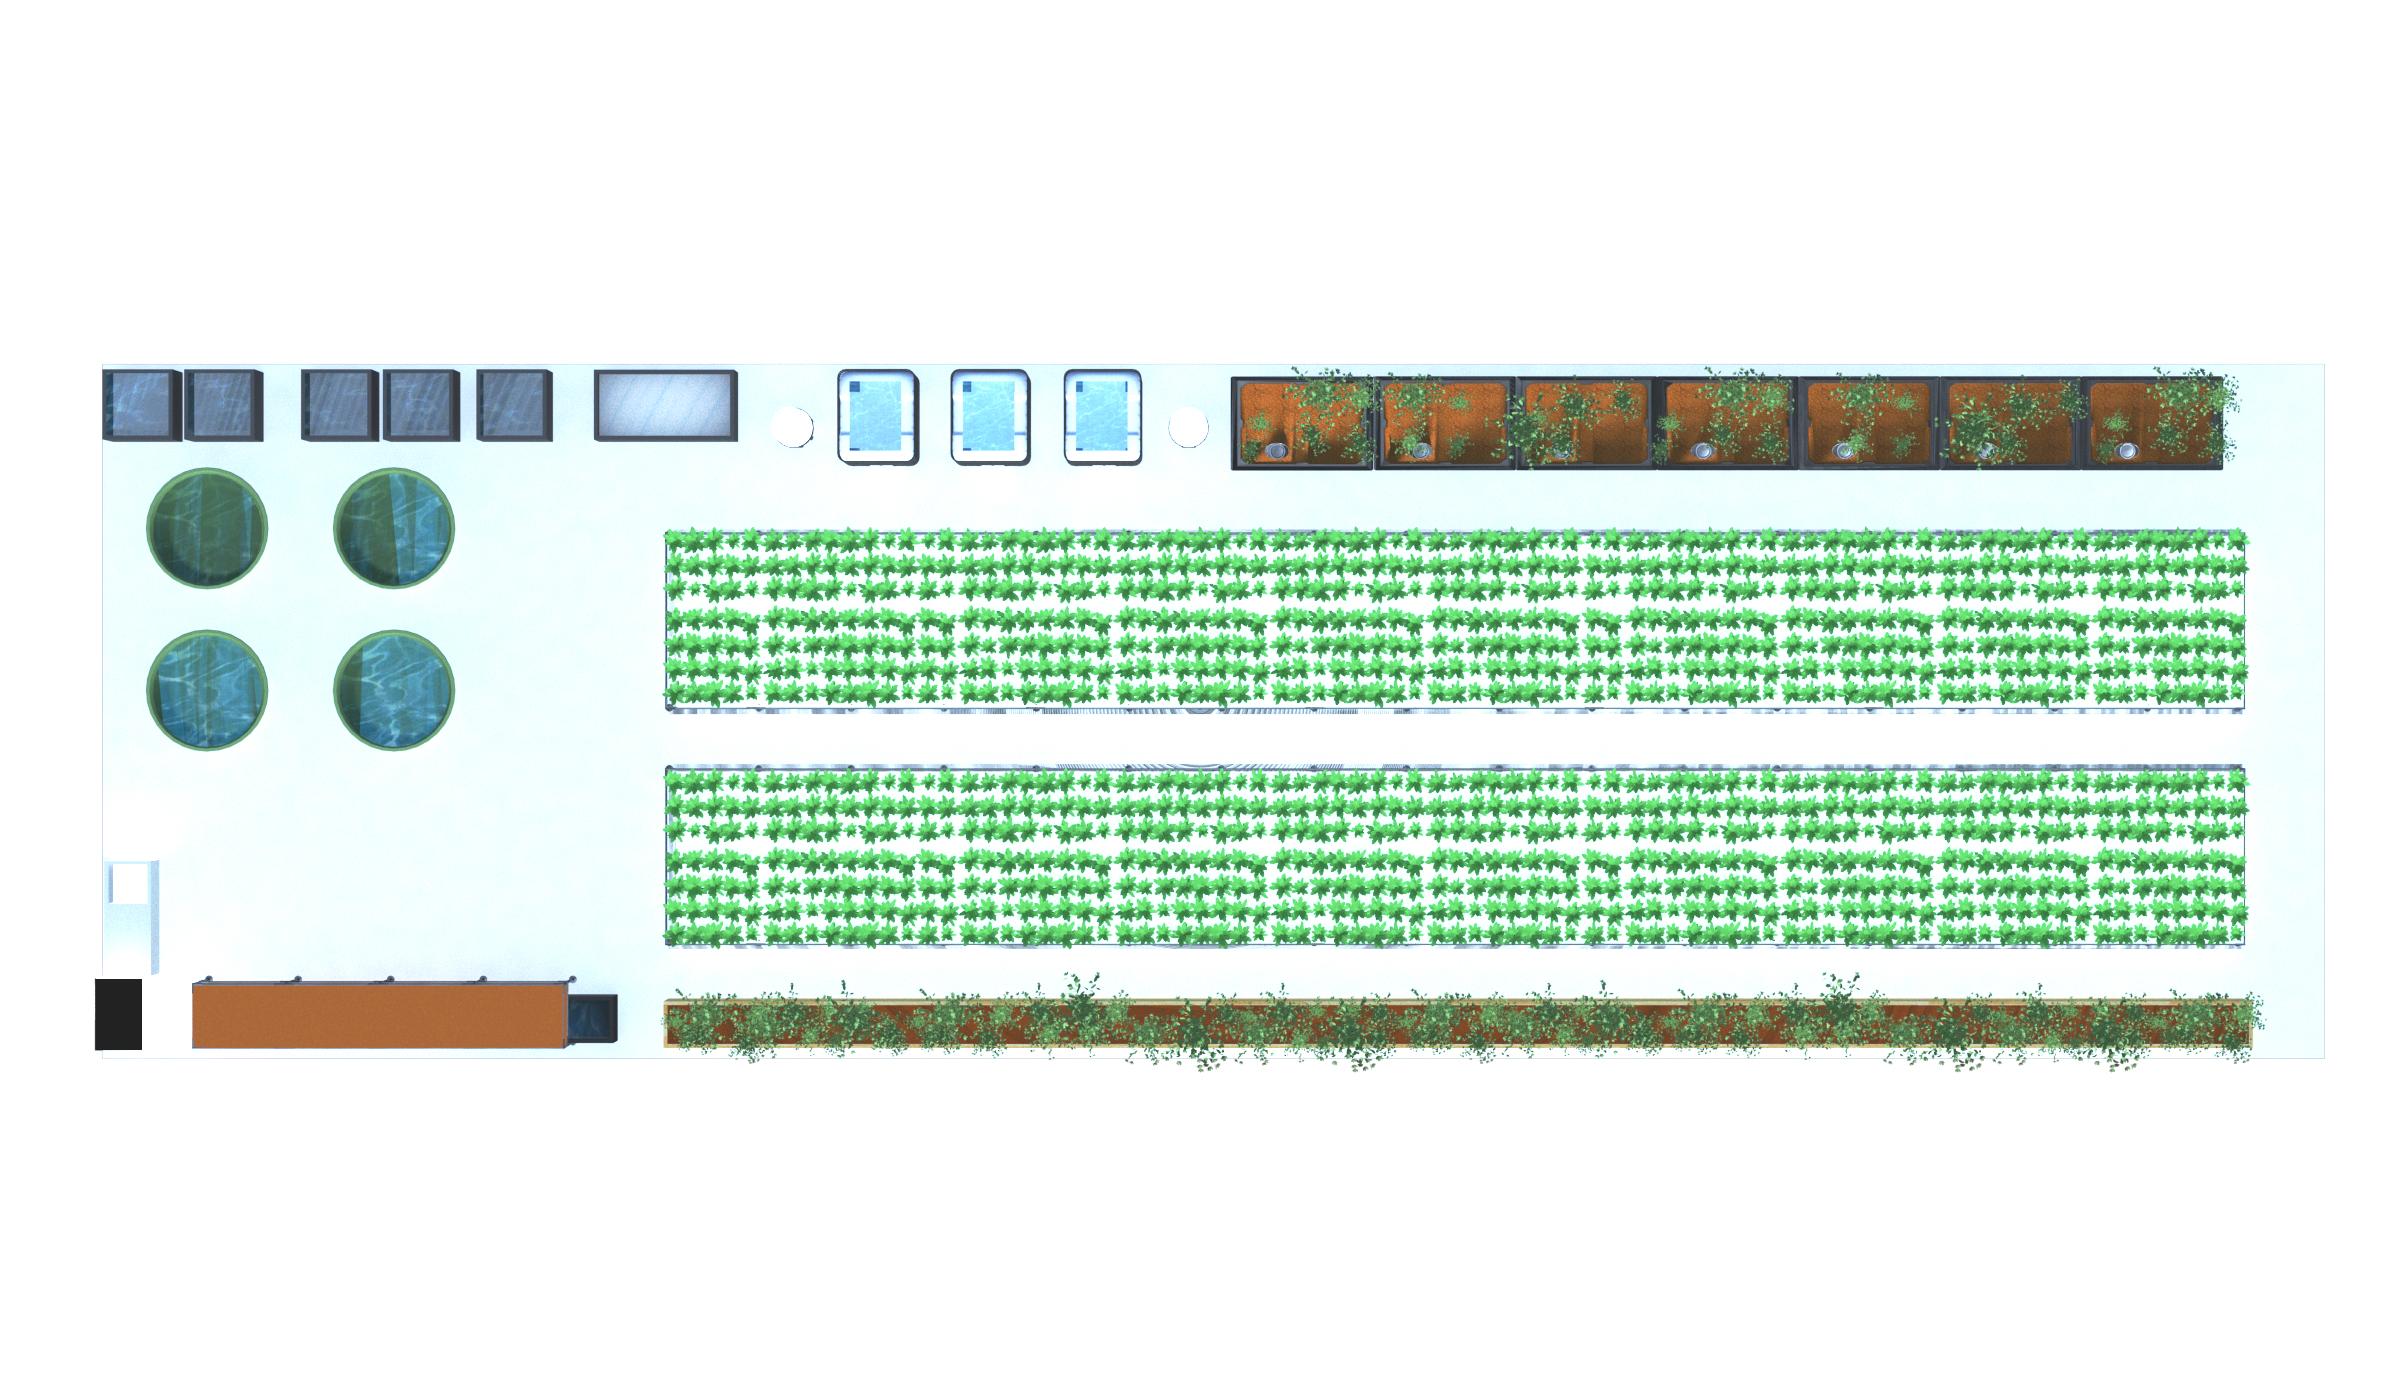 Aquaponics Greenhouse Floor Plan Ceres Greenhouse